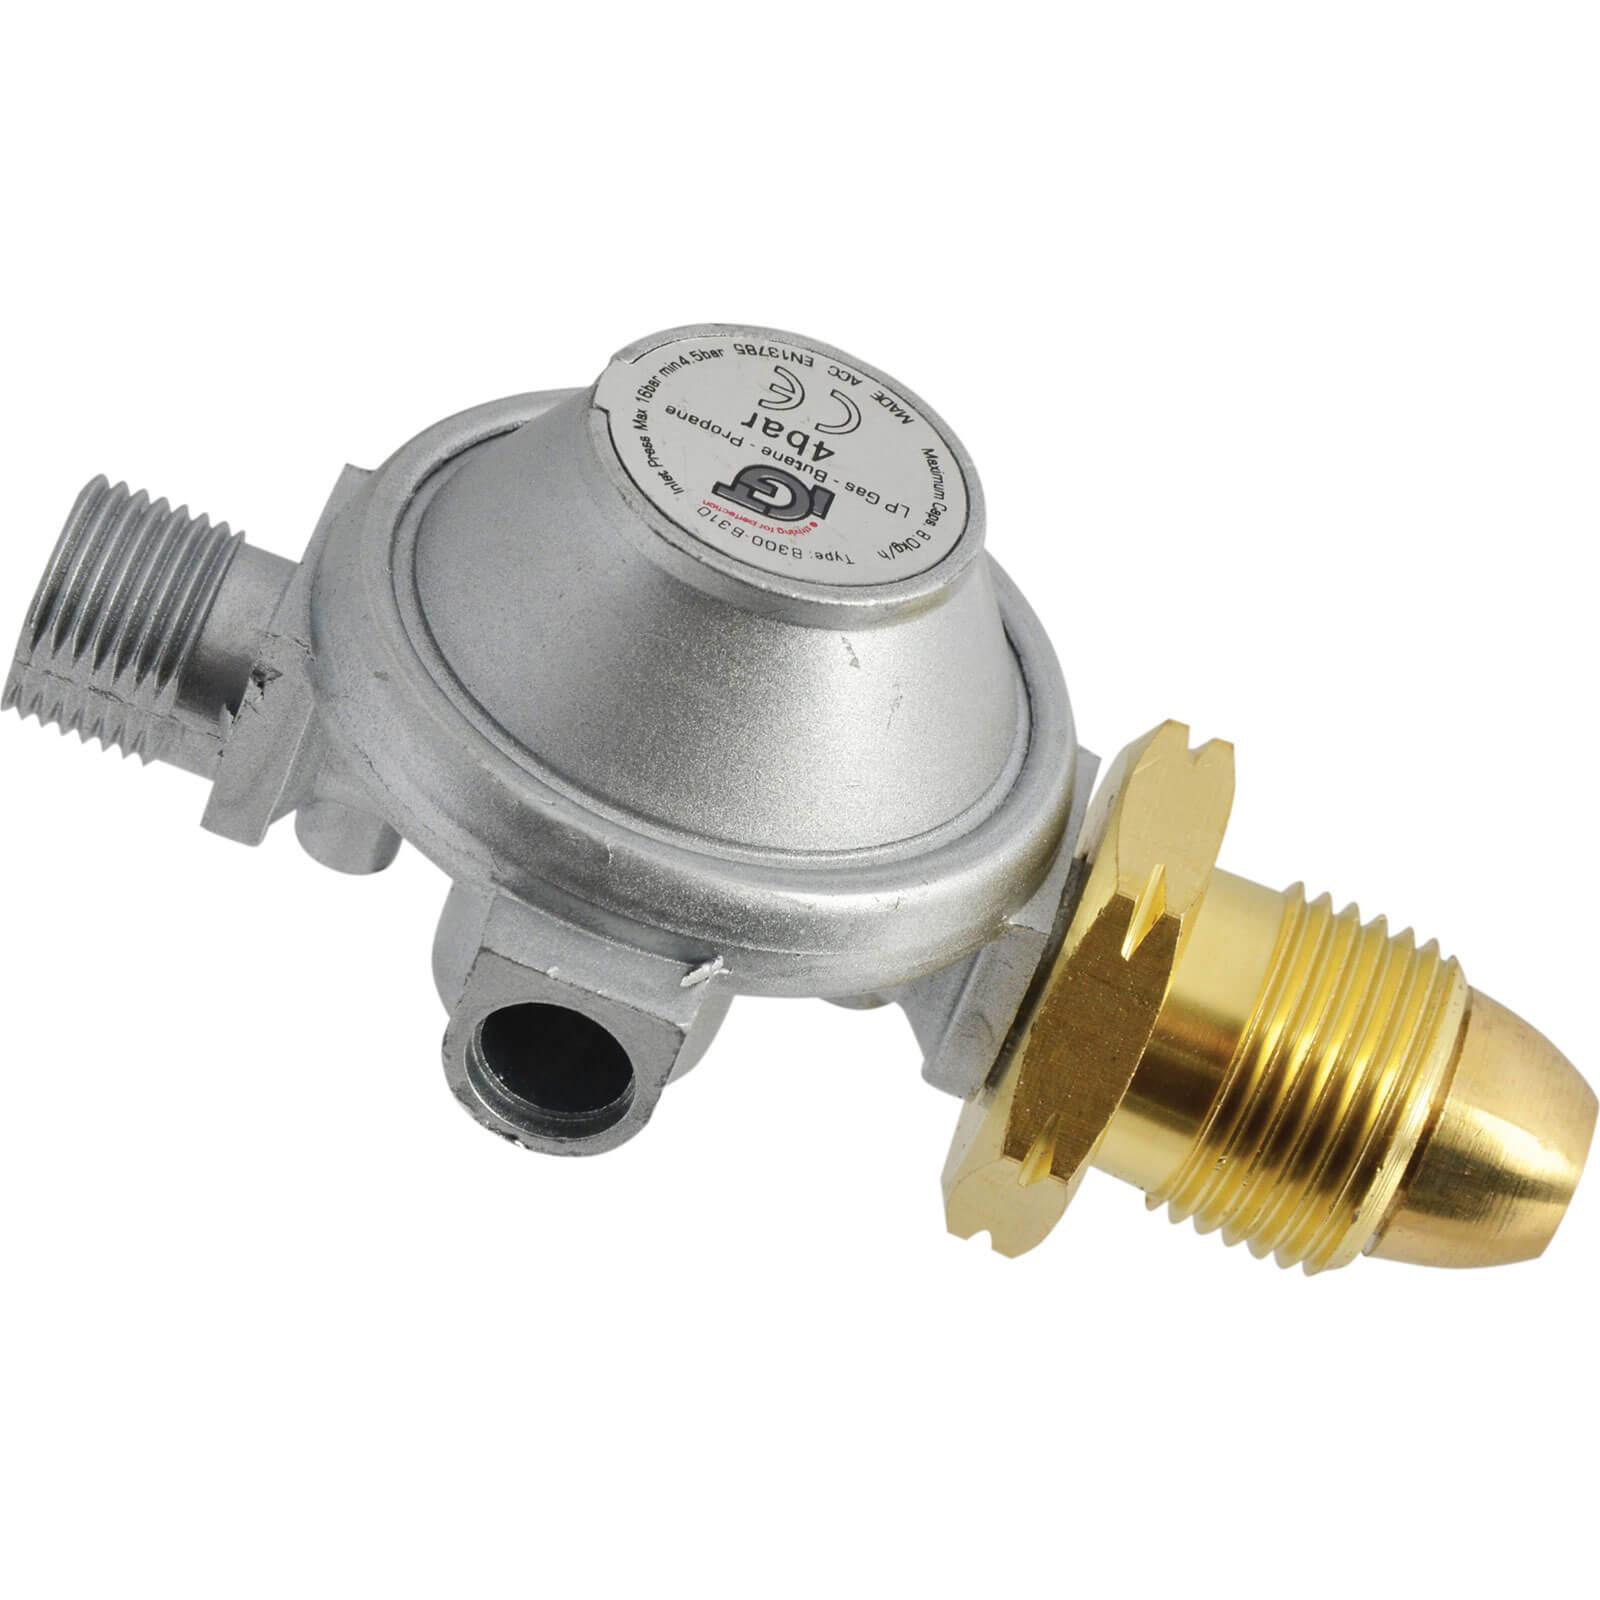 Sievert High Pressure Propane Gas Bottle Regulator